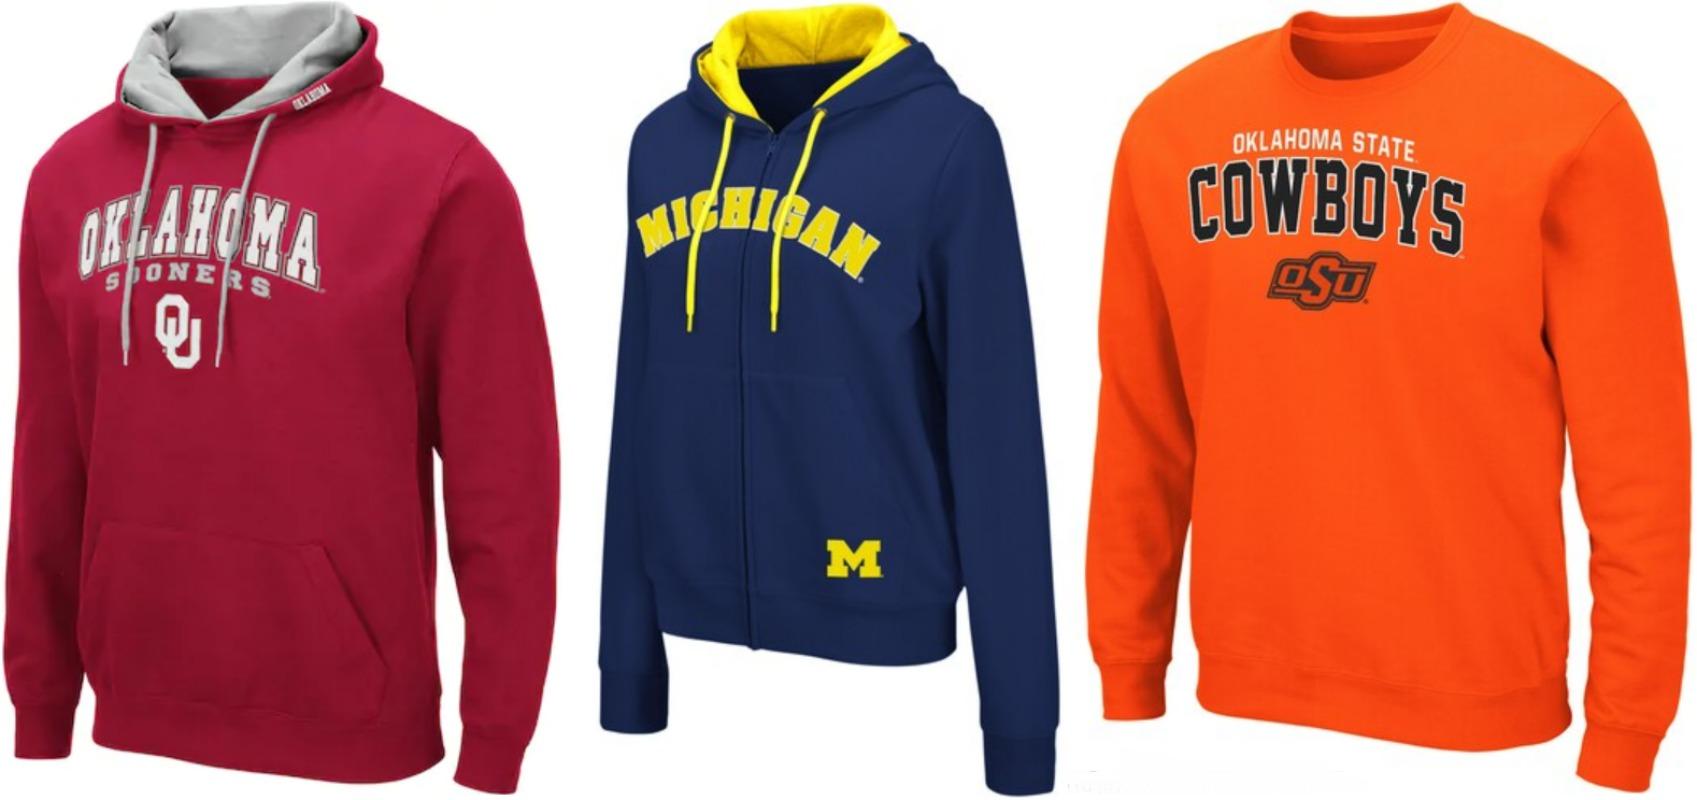 NCAA Hoodies & Shirts ONLY $19.99 at Kohl's (Reg. $40!)